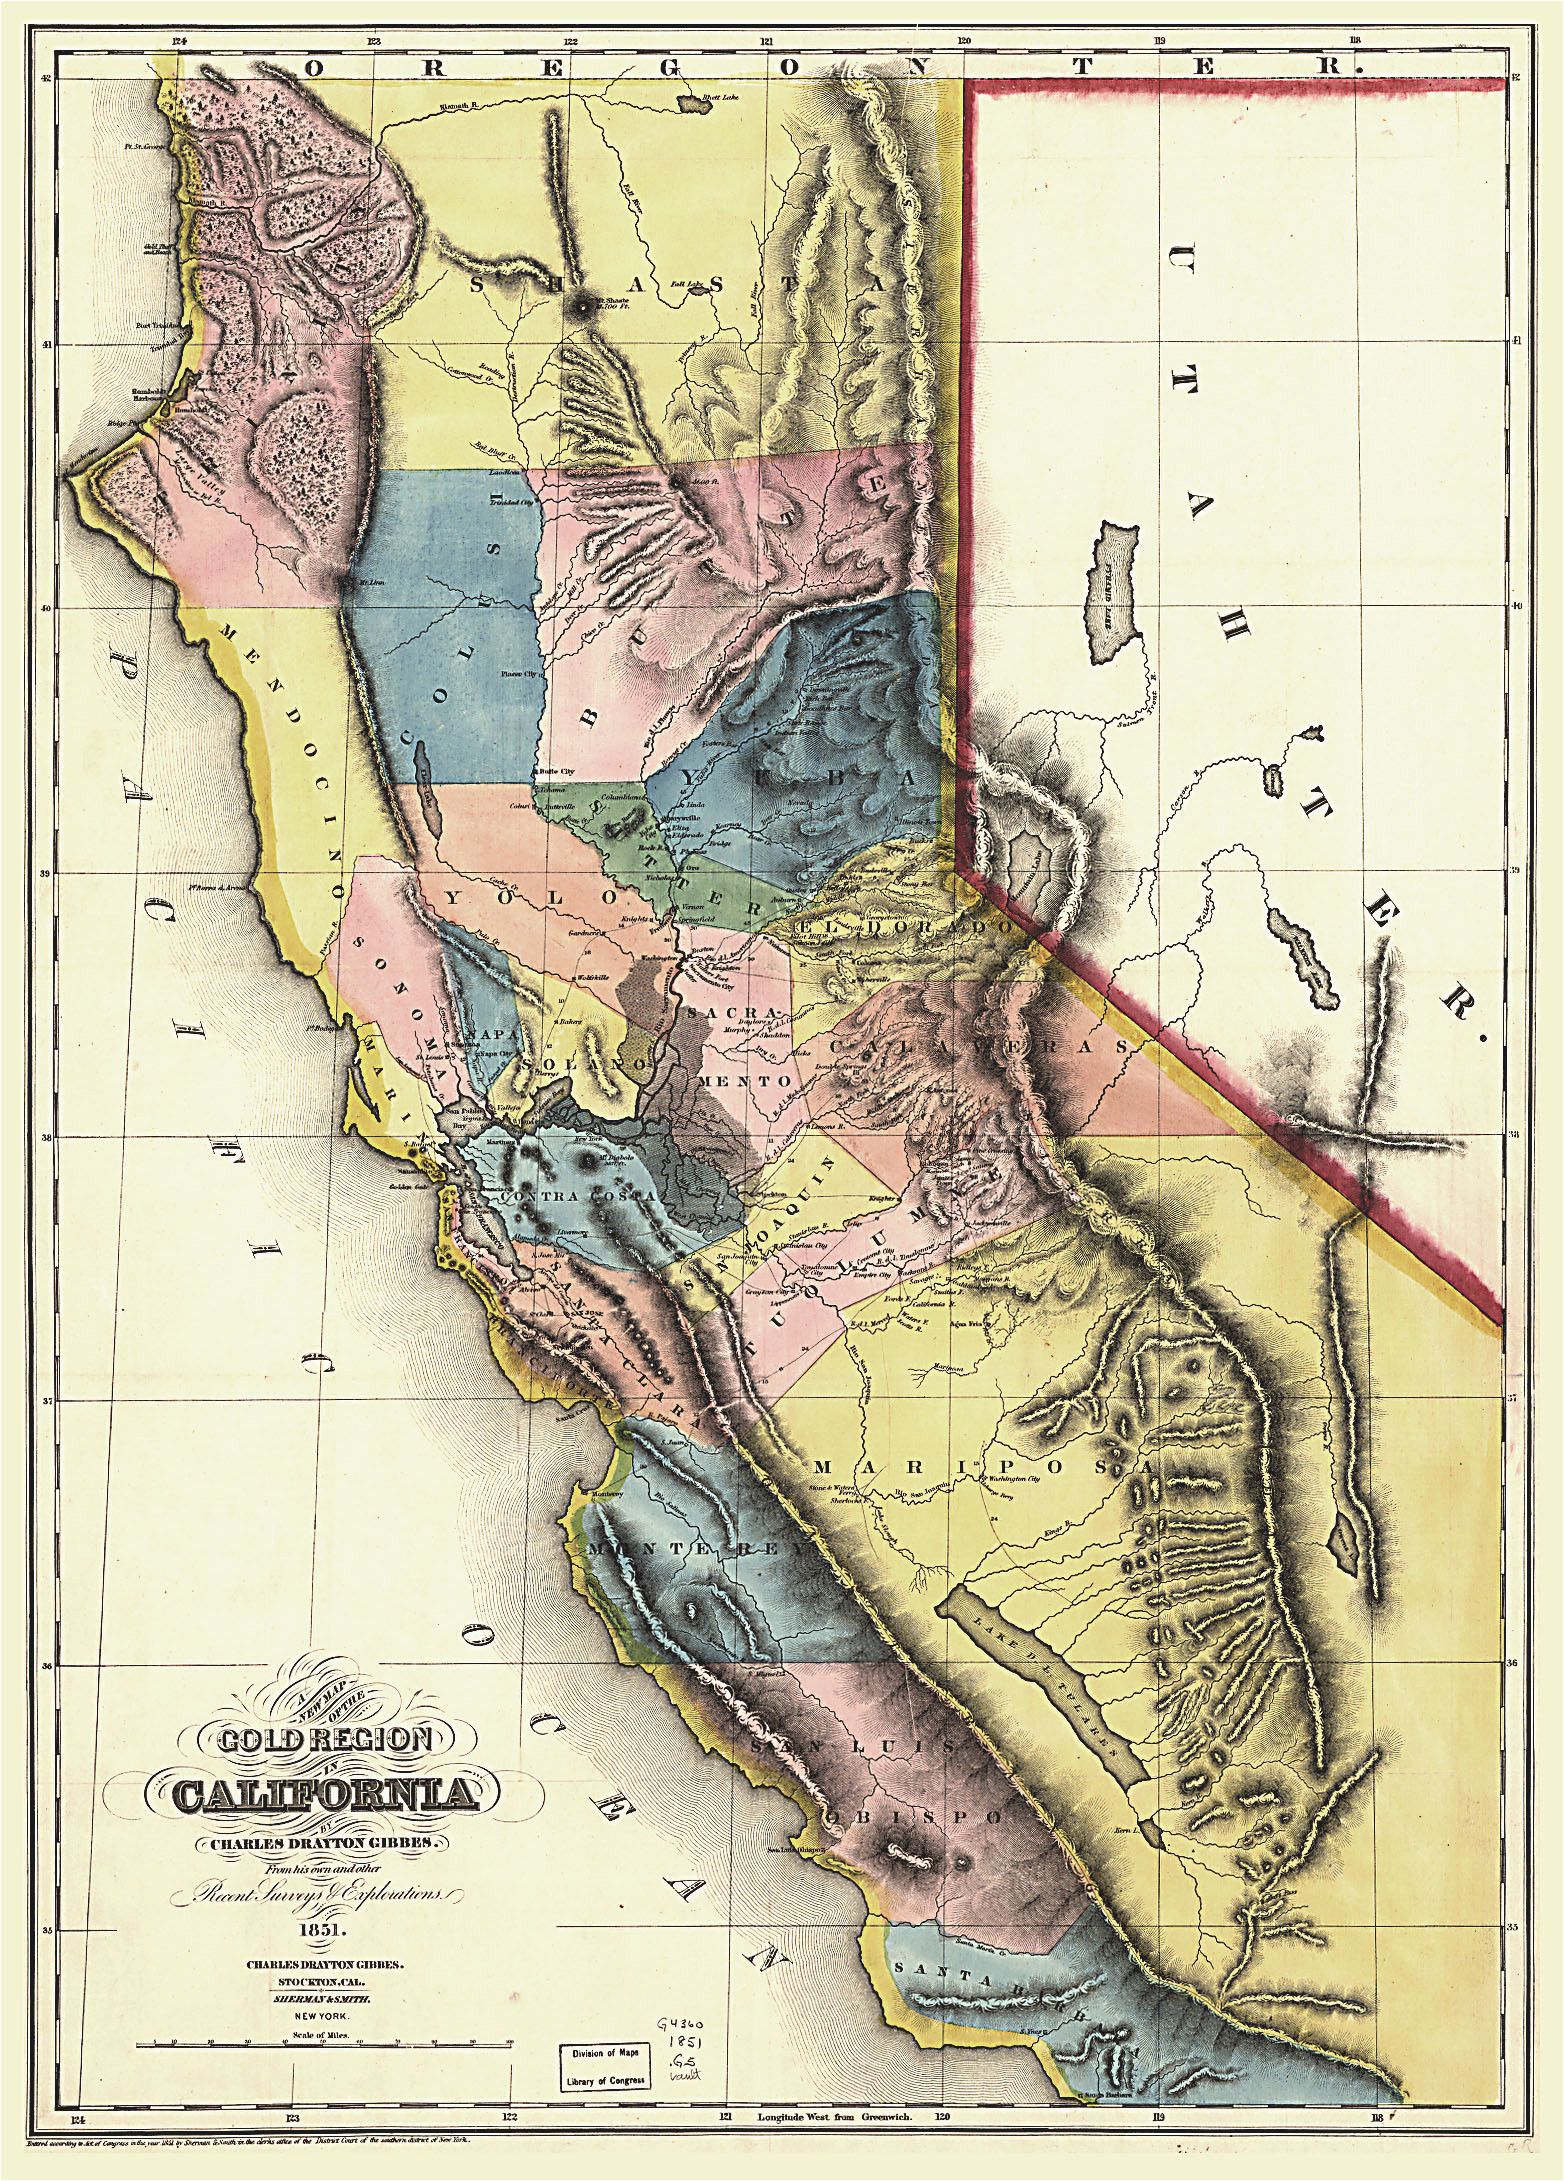 1850 mariposa county california census